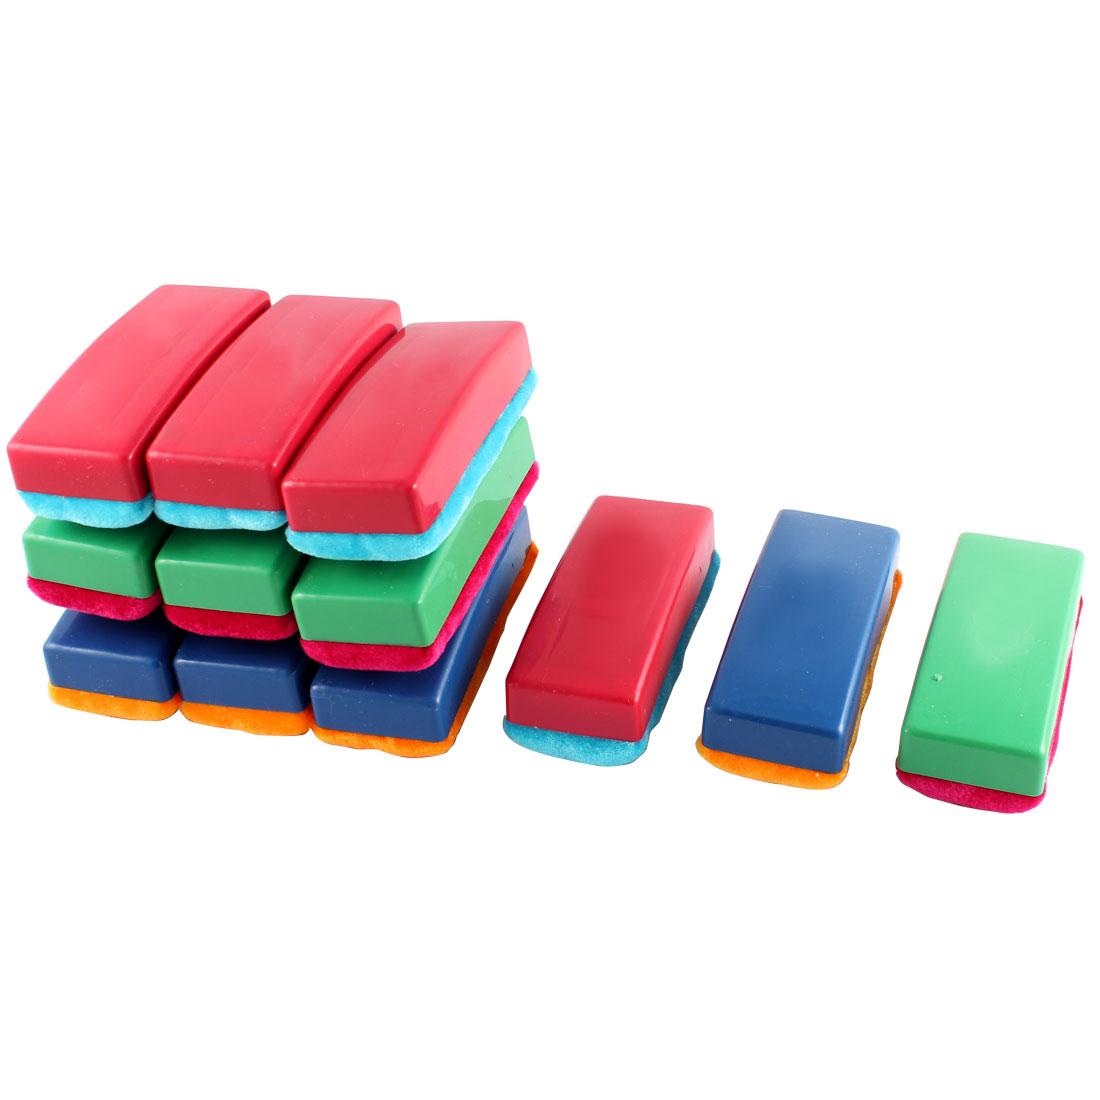 12 Pcs Plastic Shell Magnetic Blackboard Eraser Chalk Cleaner Red Blue Yellow